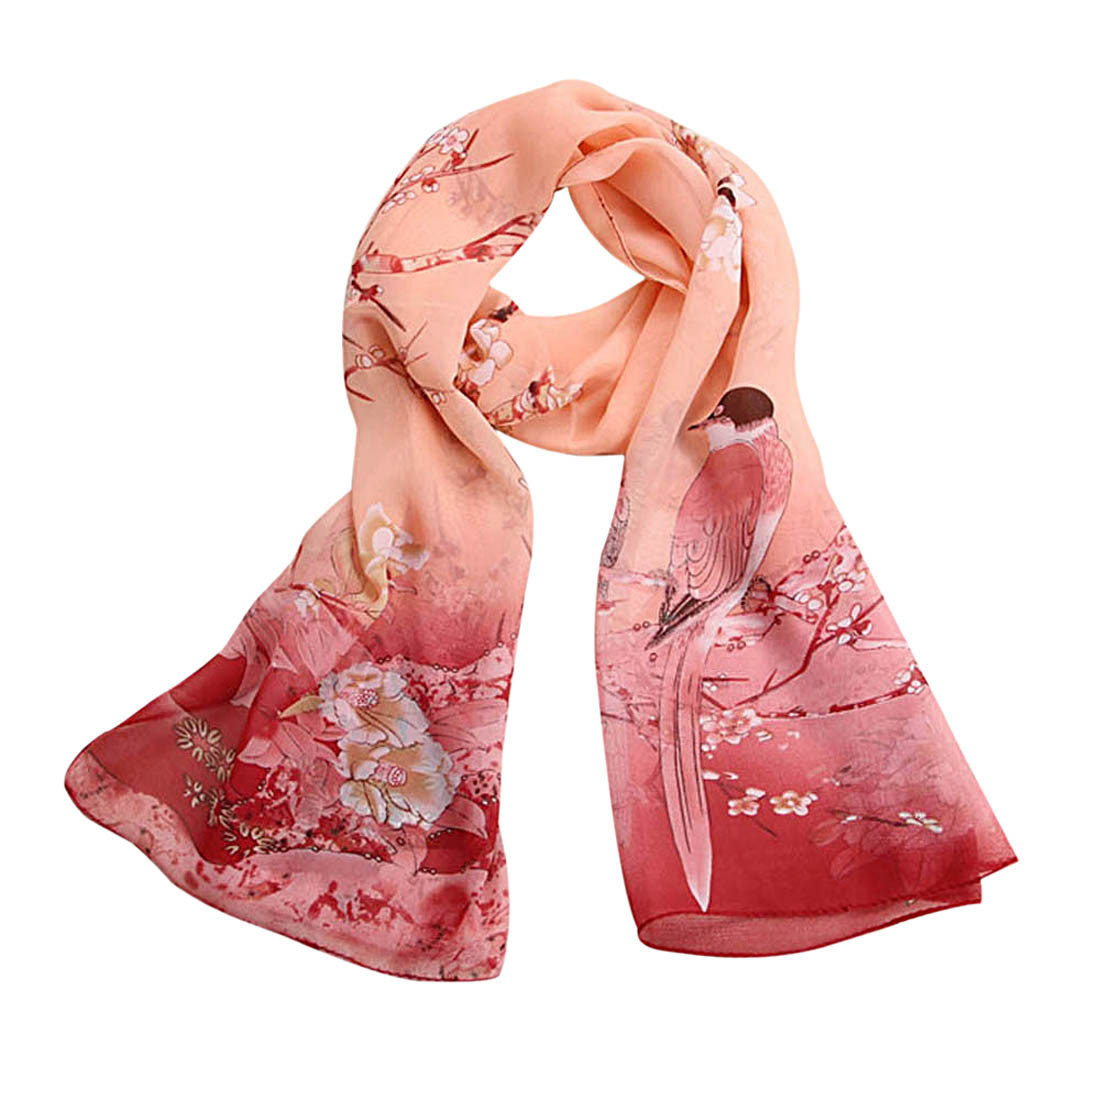 Hot 2019 New   scarf   Chiffon Soft Neck   Scarf   Shawl Spring   Scarves   Stole   Wraps   Women Long Soft Thin   Wrap   Lady Shaw #T